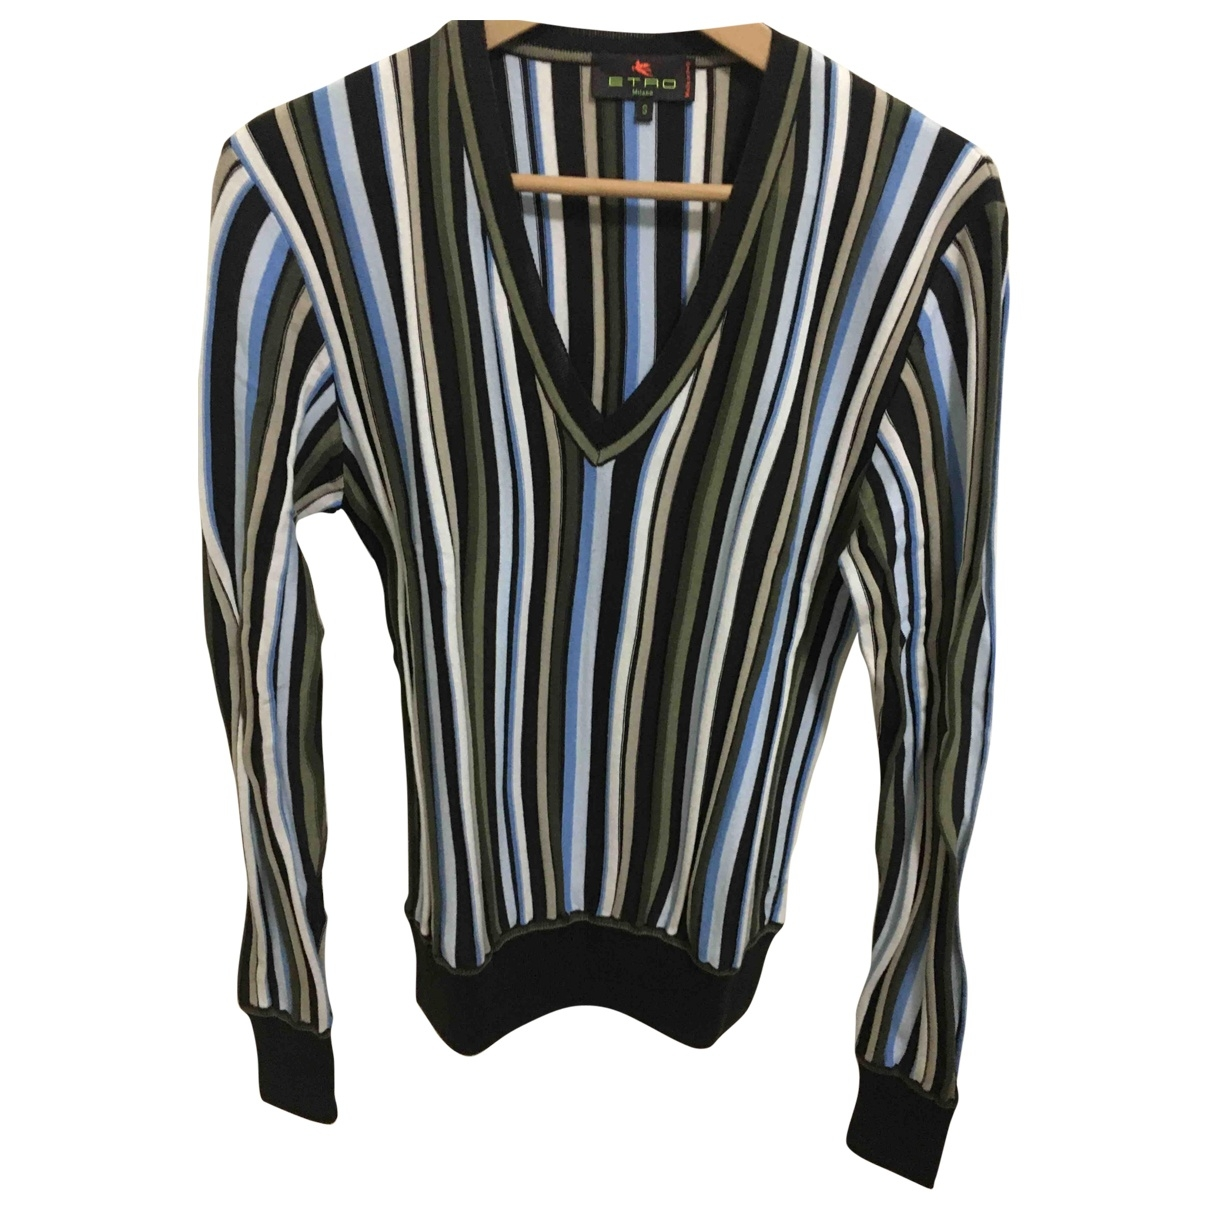 Etro \N Multicolour Cotton Knitwear & Sweatshirts for Men S International